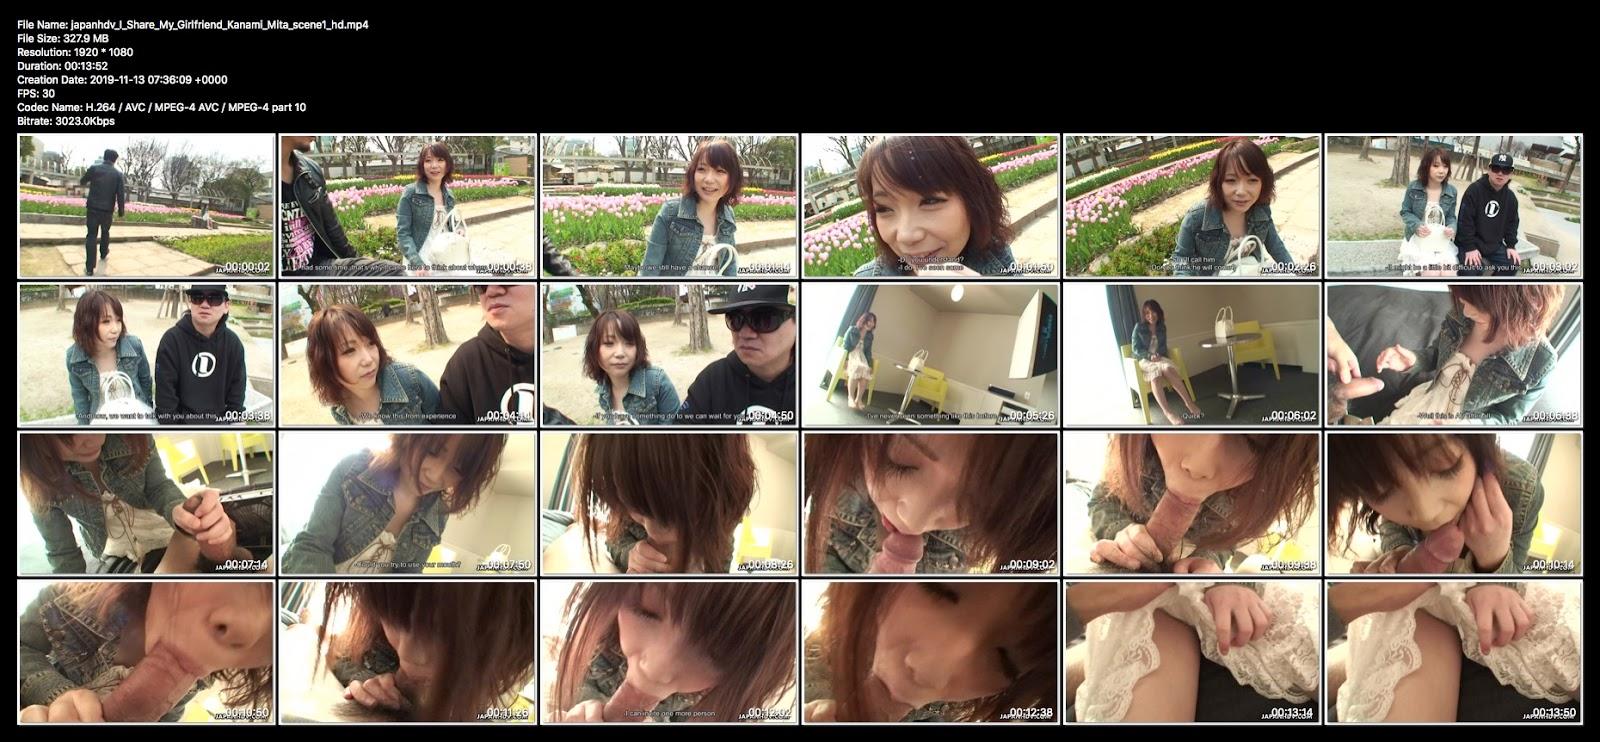 japanhdv I_Share_My_Girlfriend_Kanami_Mita_scene1_hd